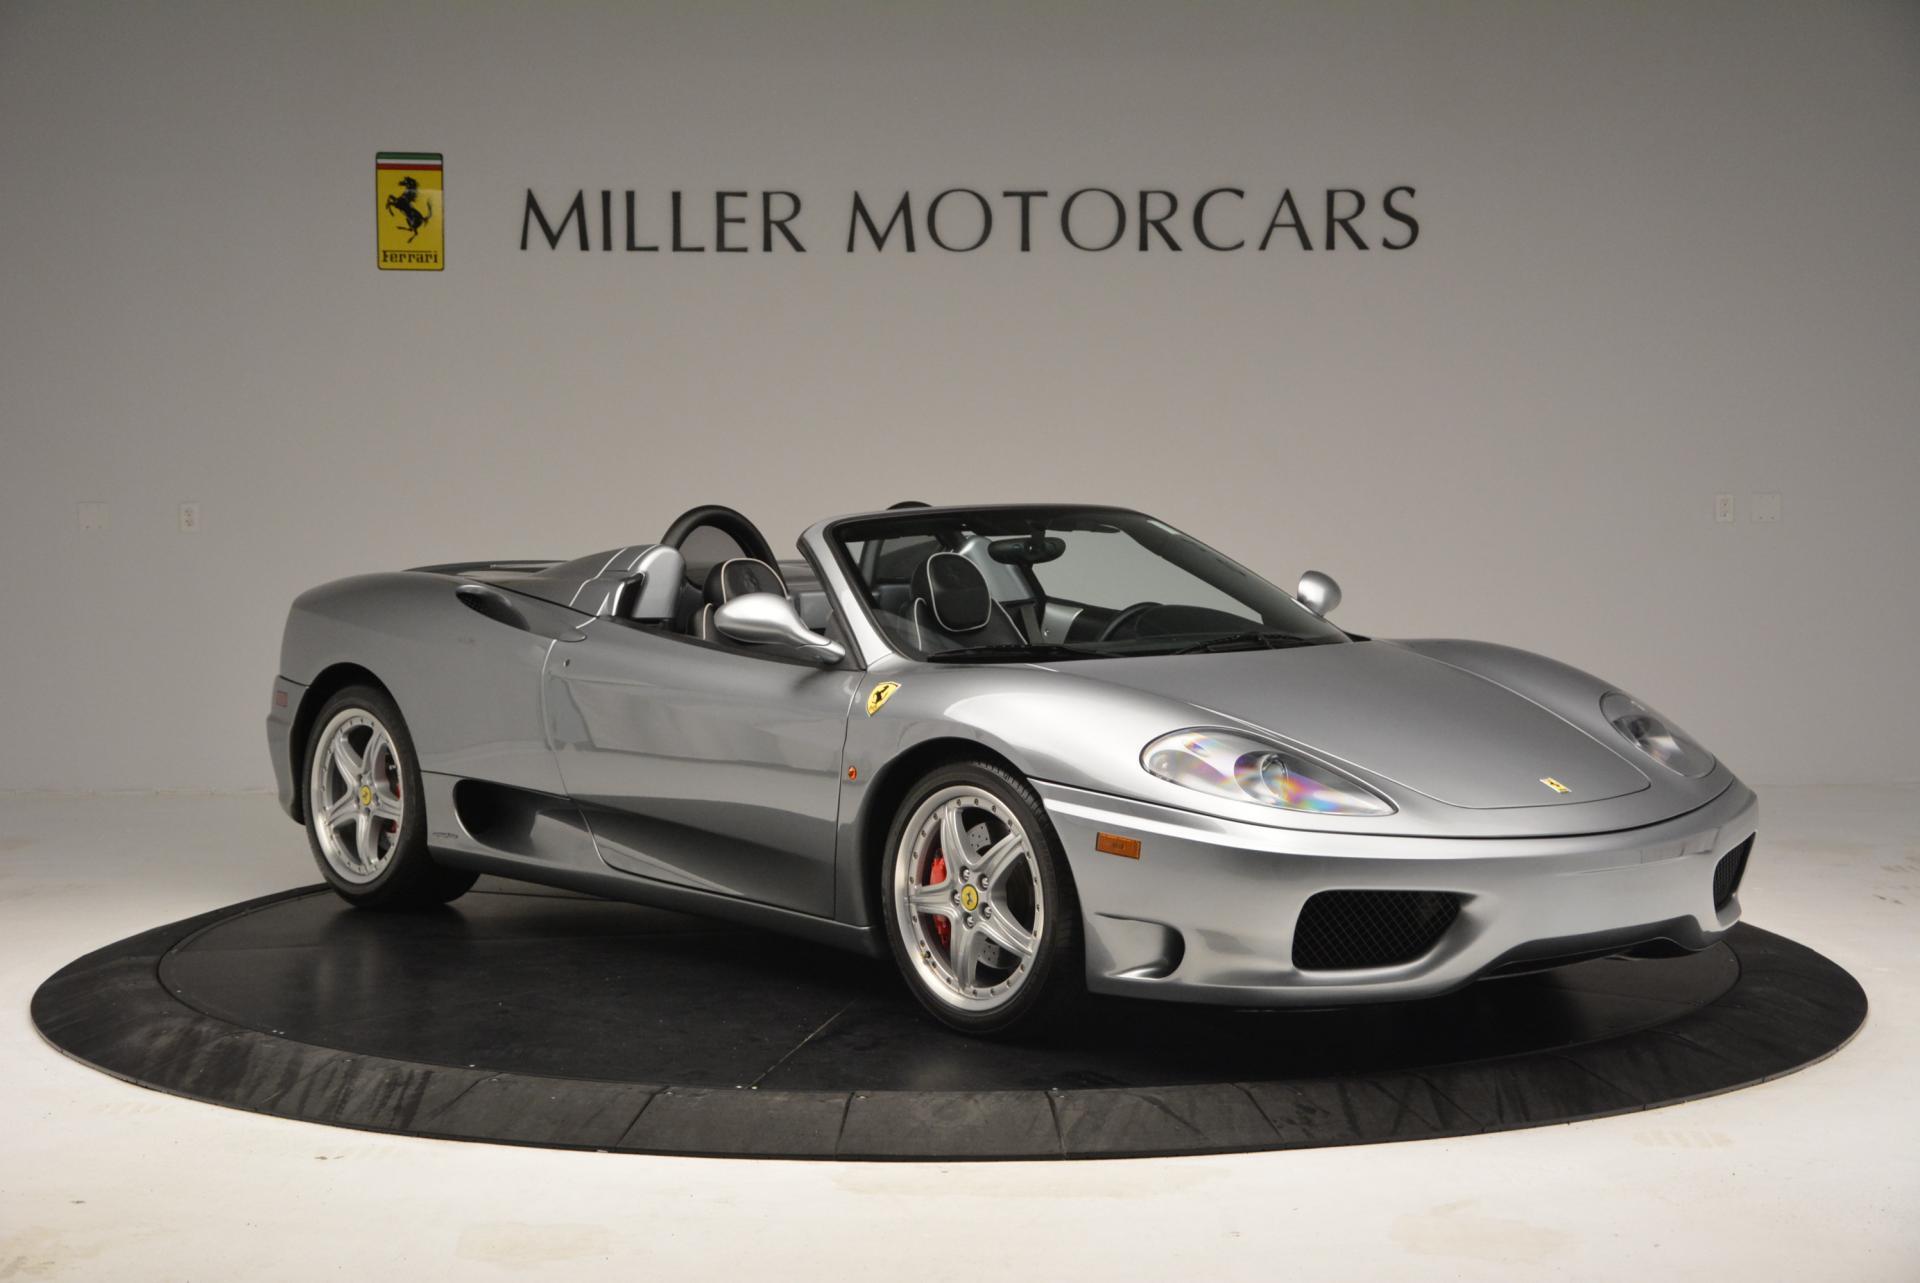 Used 2004 Ferrari 360 Spider 6-Speed Manual  For Sale In Greenwich, CT. Alfa Romeo of Greenwich, 4317 138_p11